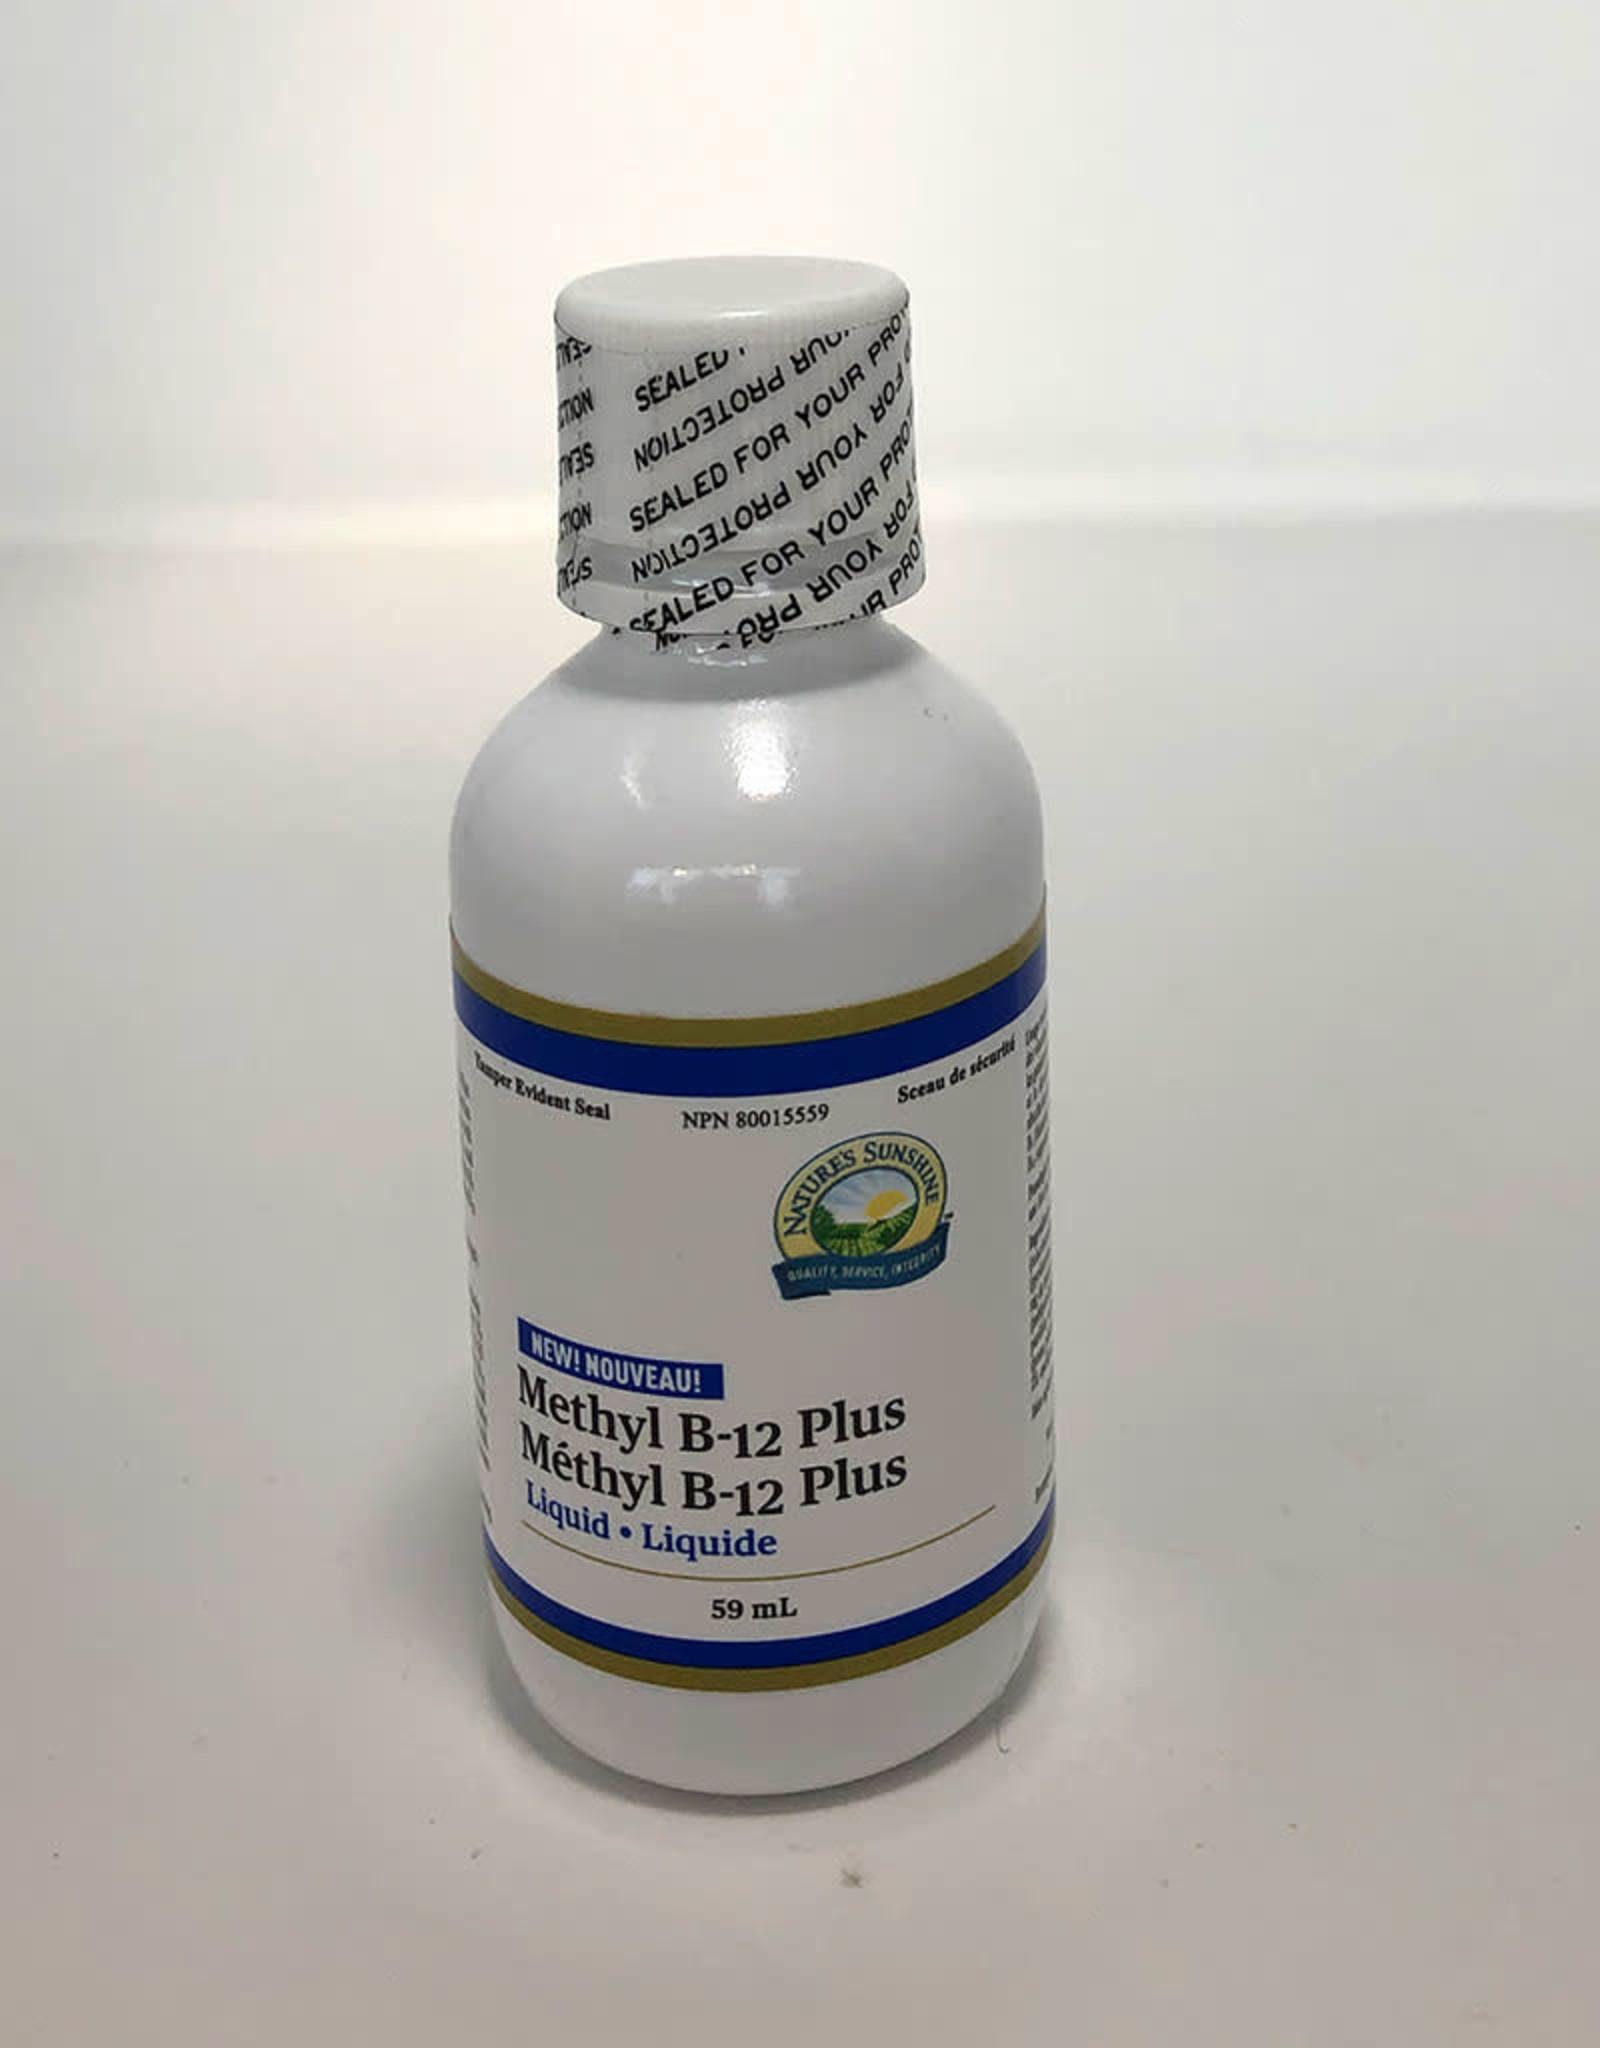 Natures Sunshine NS - Methyl B-12 Plus, 59ml